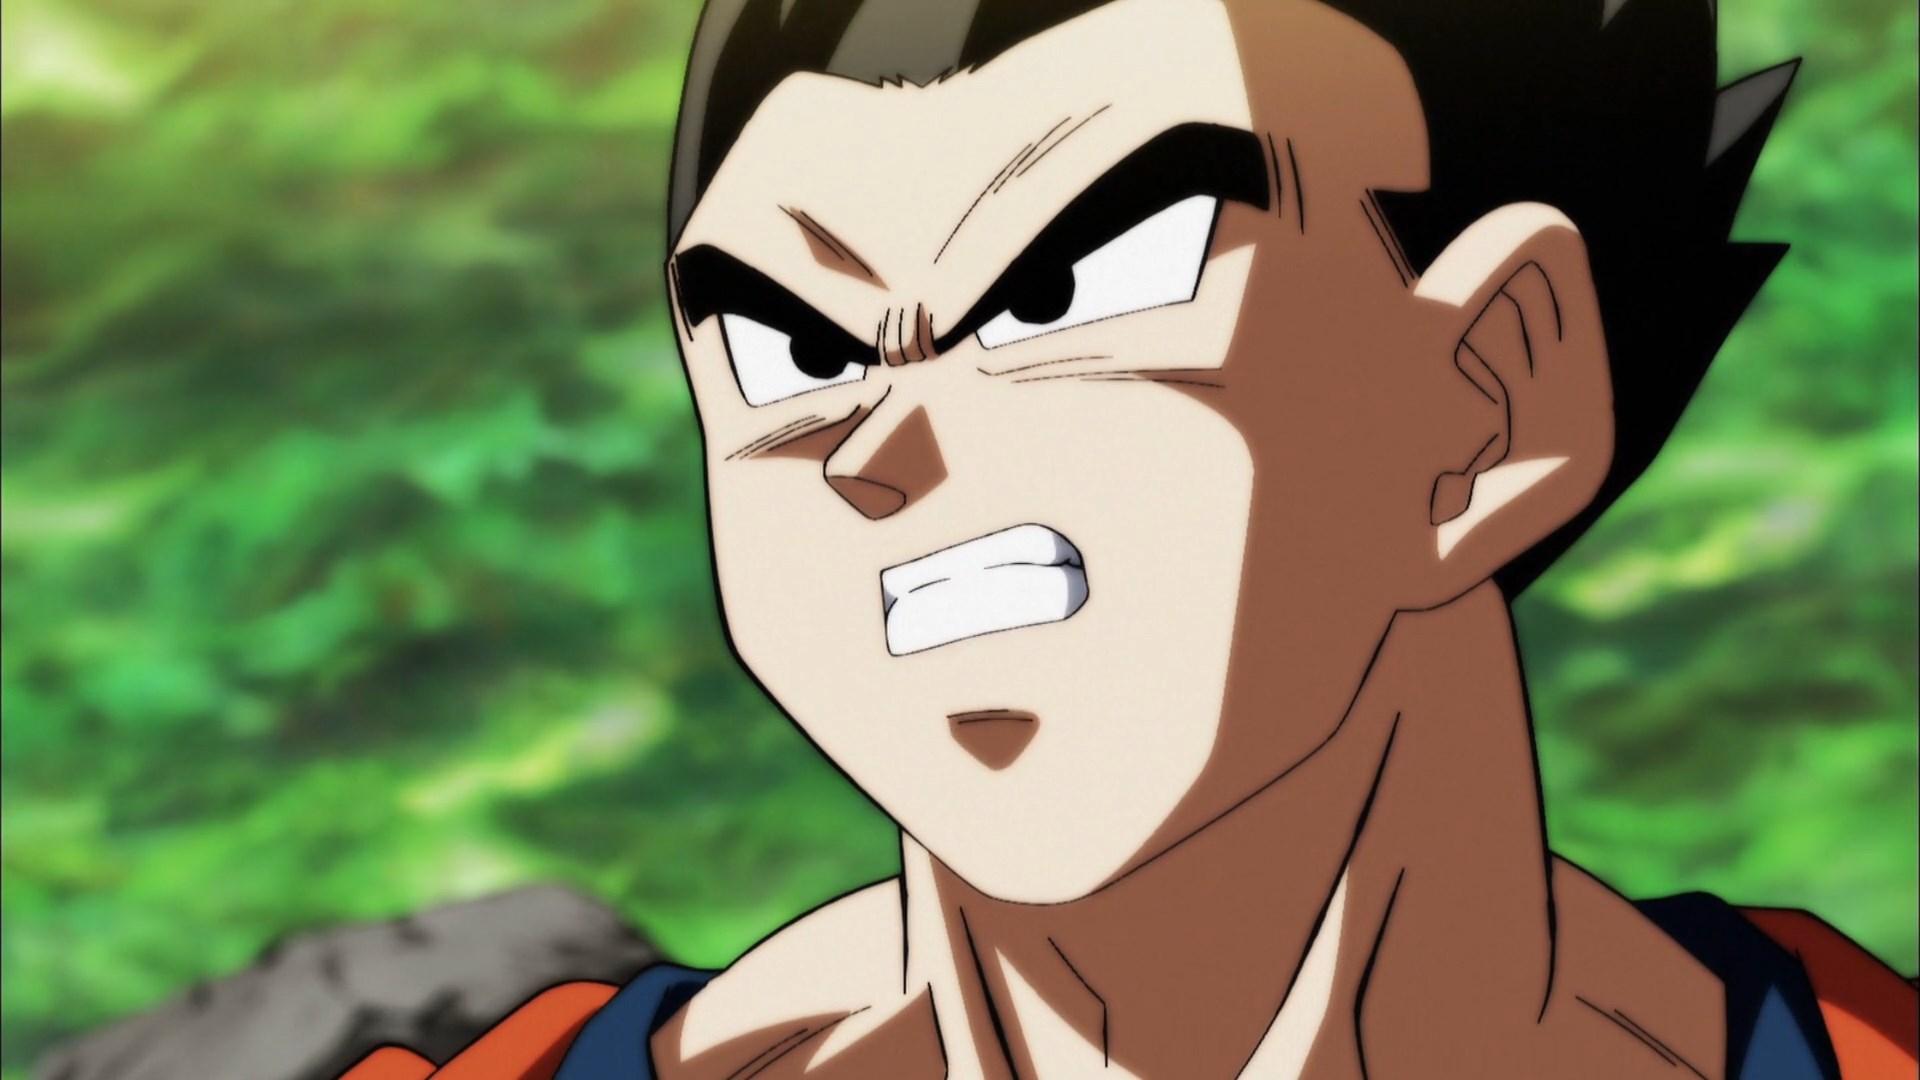 [HorribleSubs] Dragon Ball Super - 121 [1080p].mkv_snapshot_05.23